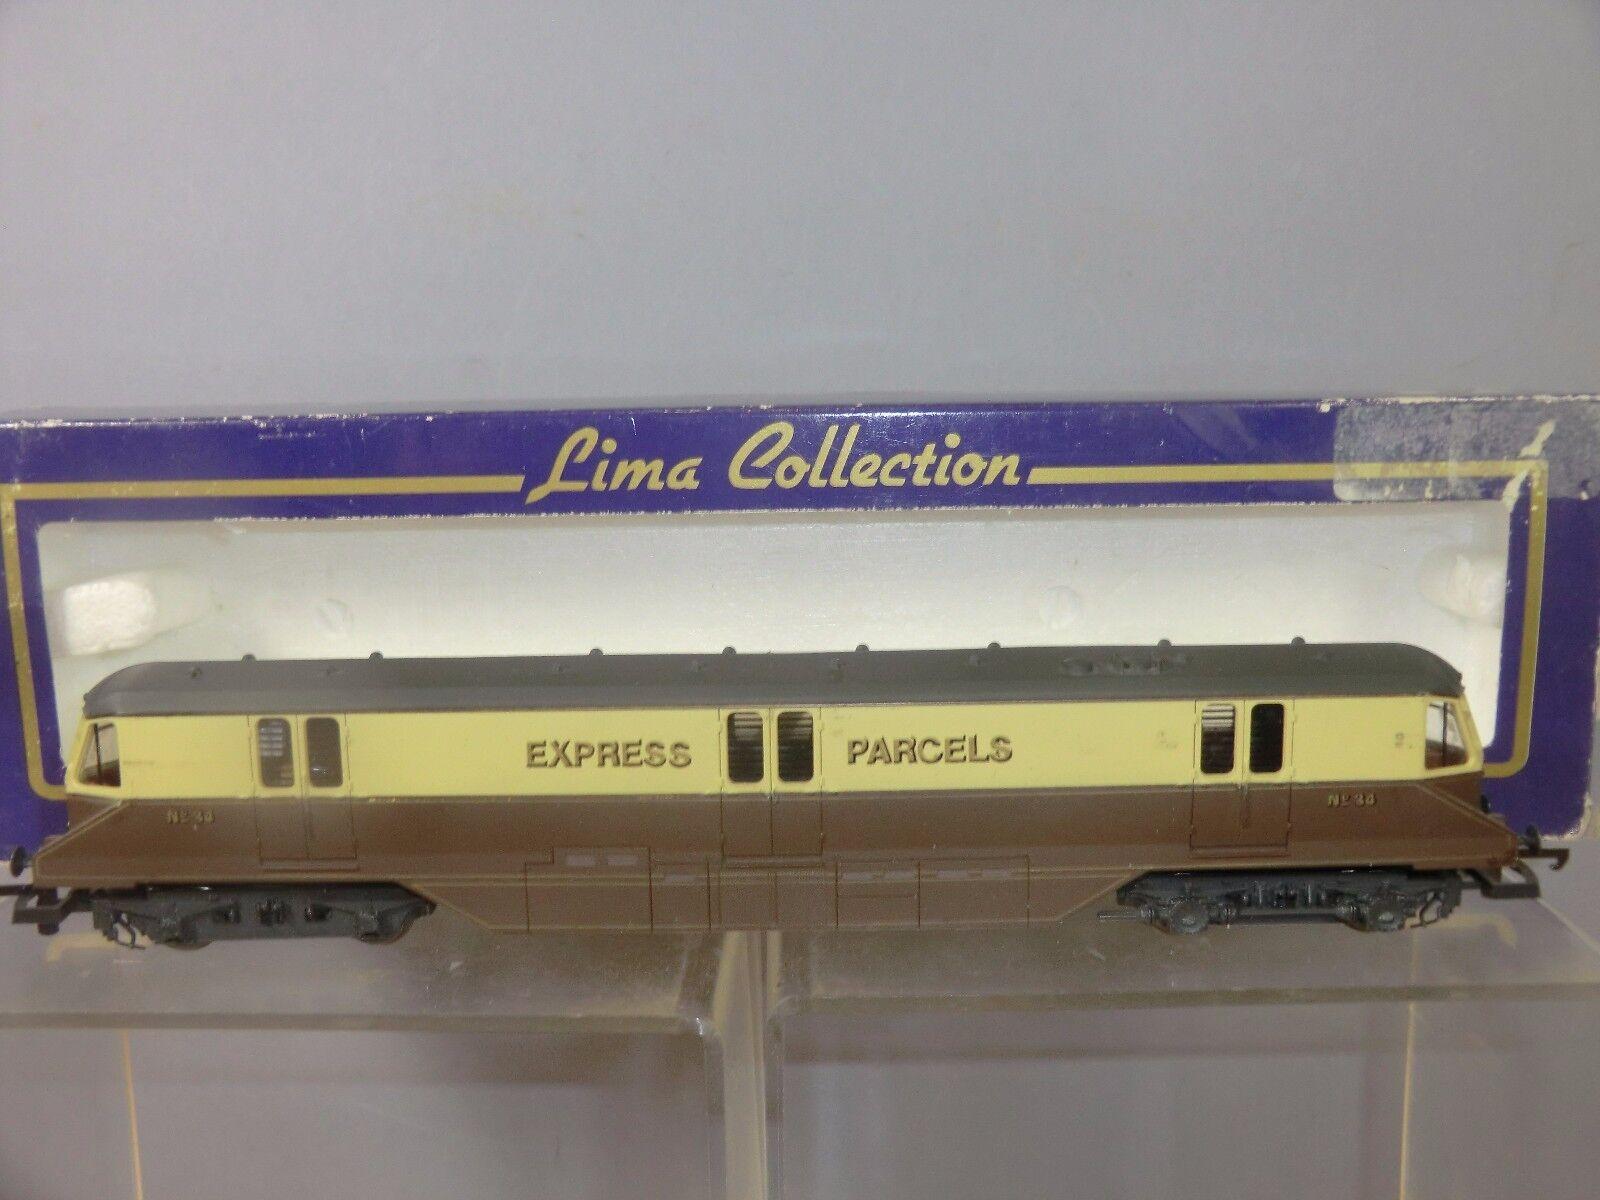 LIMA  MODEL No.2051 GWR EXPRESS PARCELS RAILCoche  ( marrón & CREAM LIVERY)  VN MIB